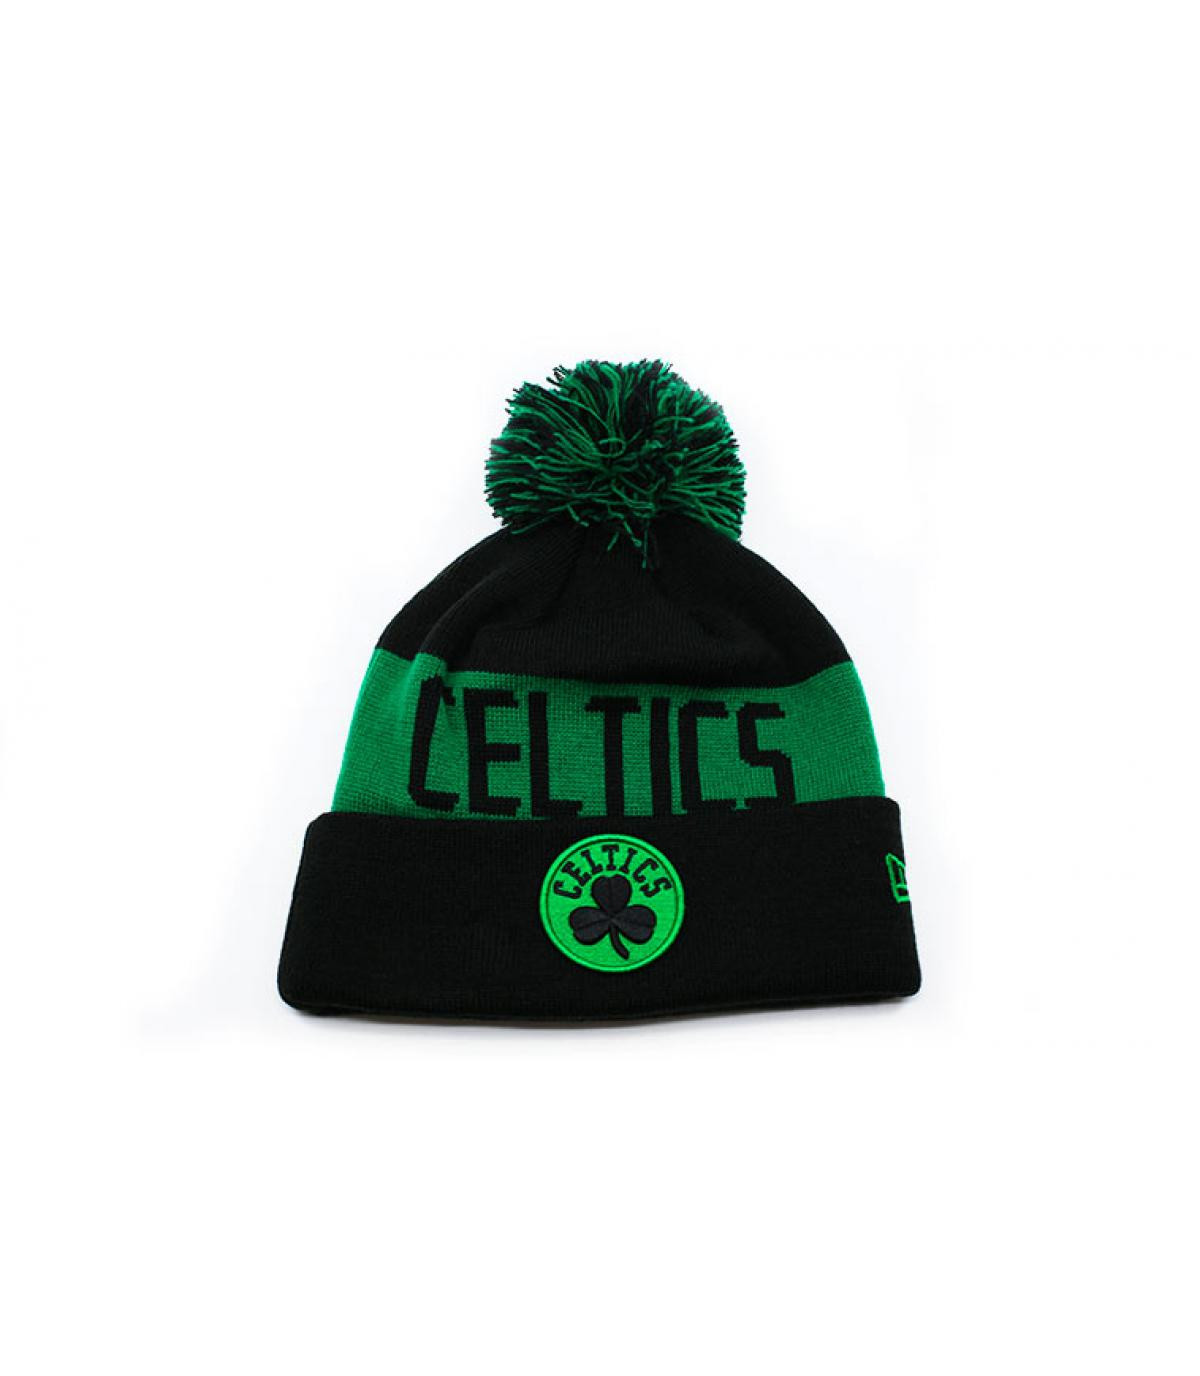 Celtics revers zwart groen